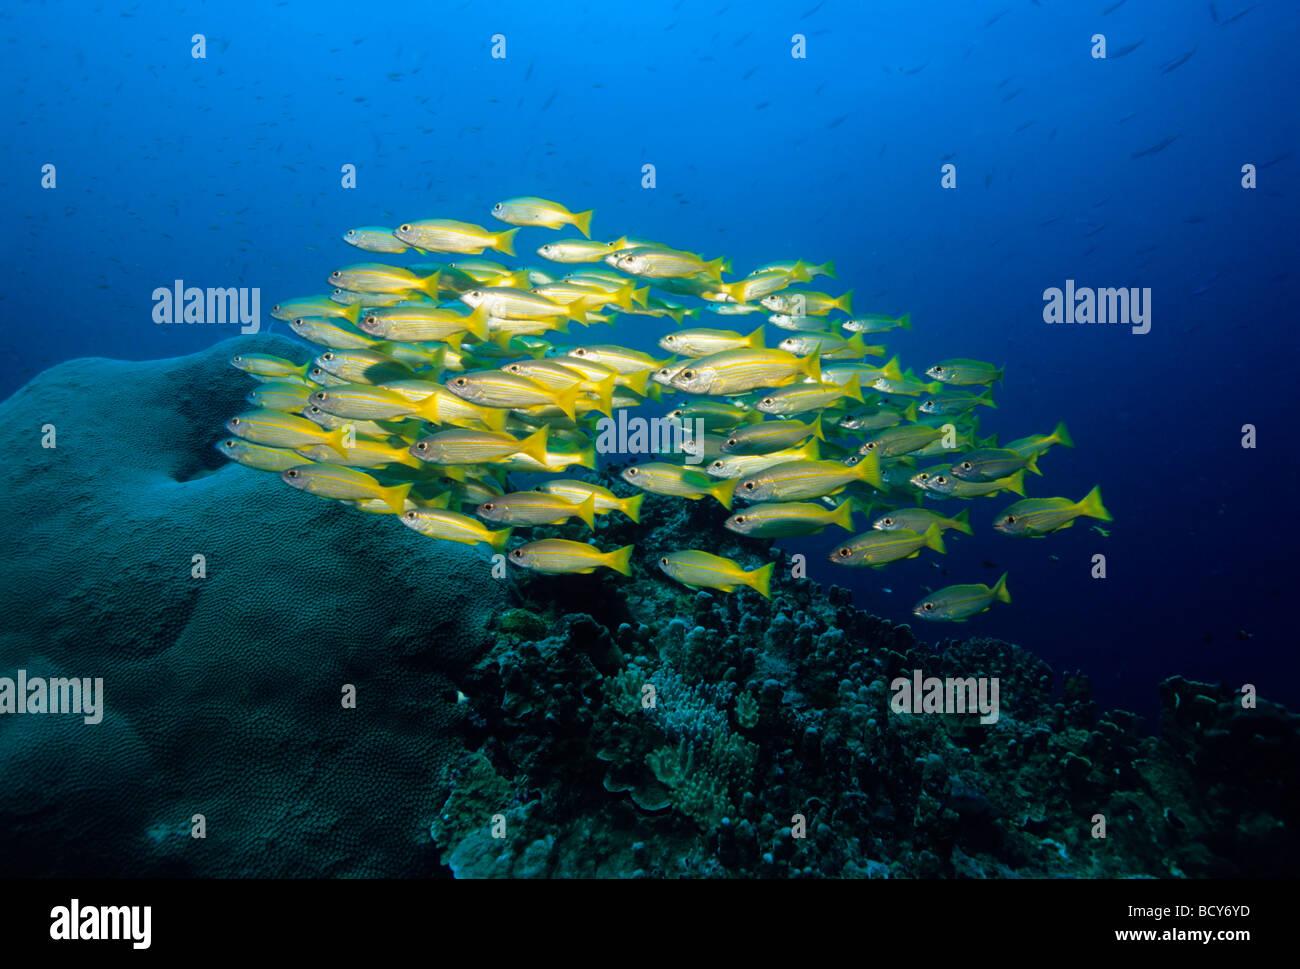 School of Goldband Fusiliers (Pterocaesio chrysozona), Similan Islands, Andaman Sea, Thailand, Asia, Indian Ocean - Stock Image